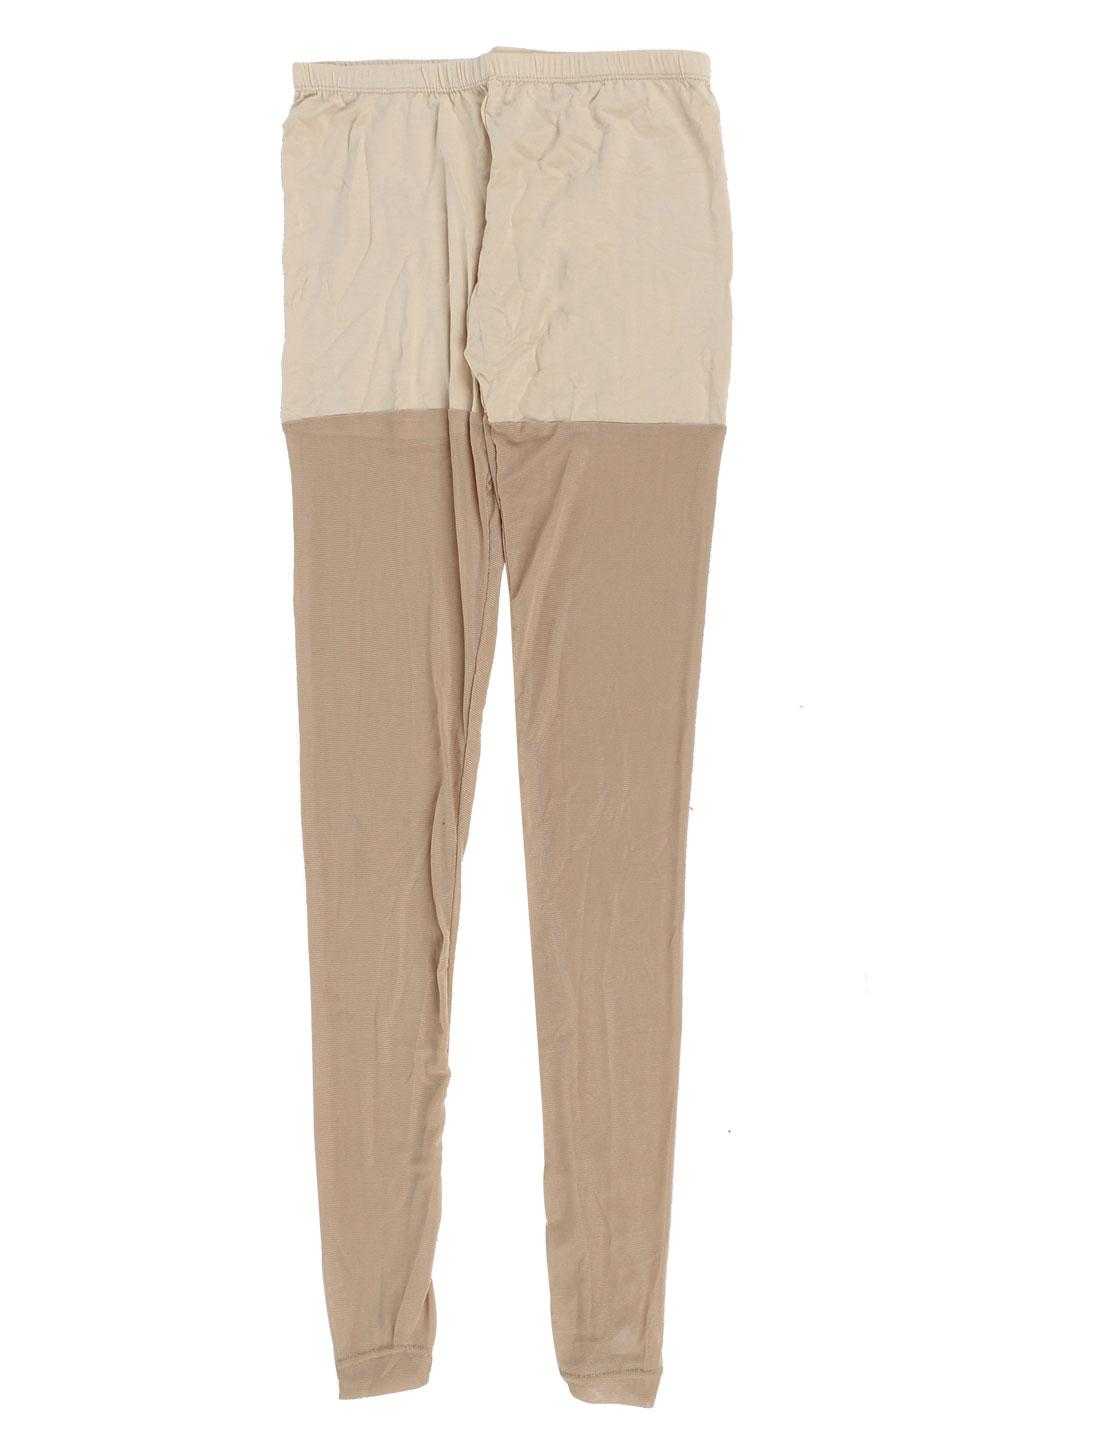 Women Skin Tone Stretch Waist Semi Sheer Leggings Net Stirrup Pantyhose US 4